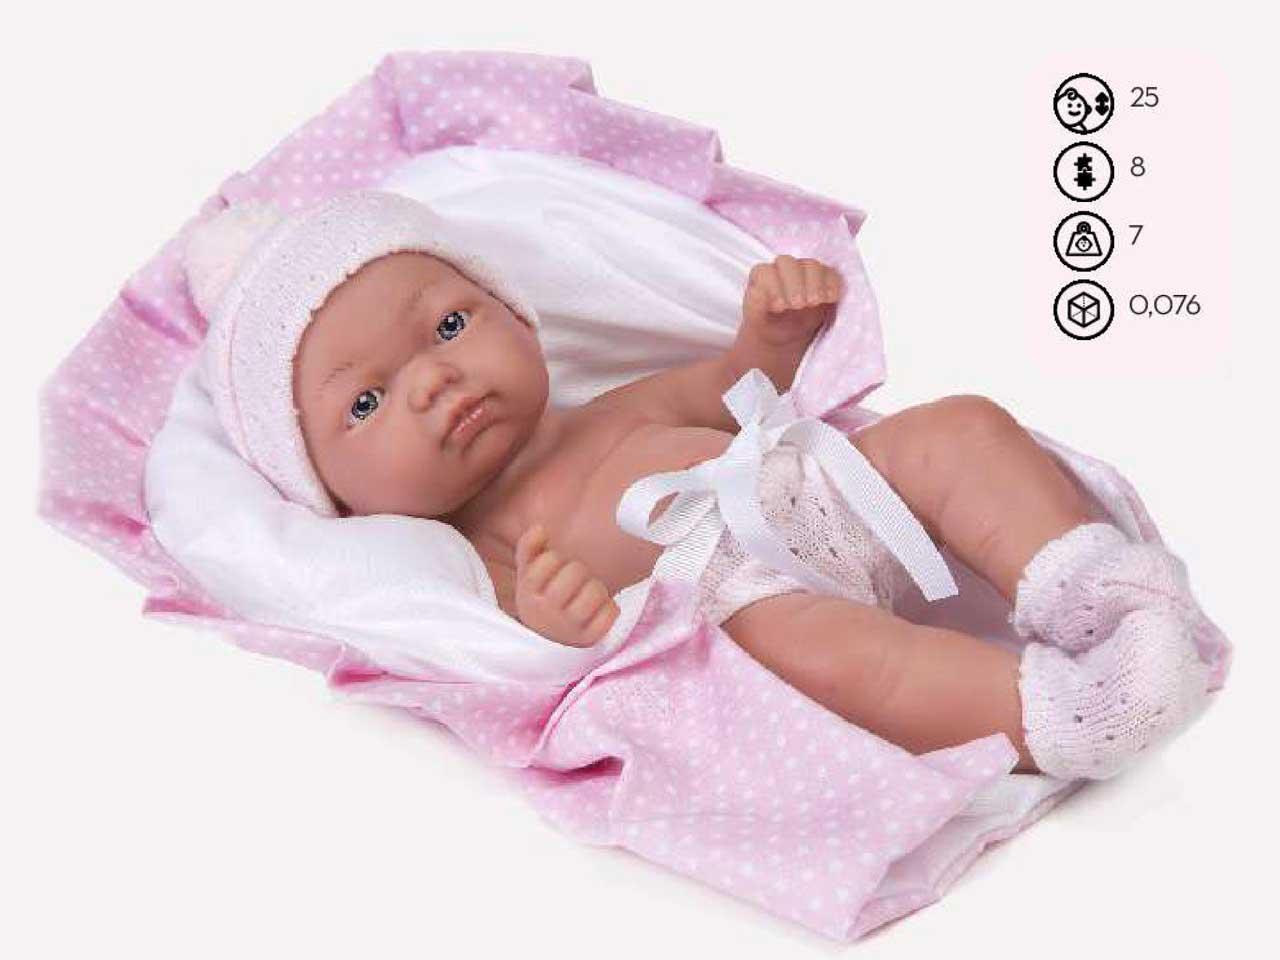 BAMBOLA CON PORT ENFANT ROSA 25 CM SCATOLA SINGOLA